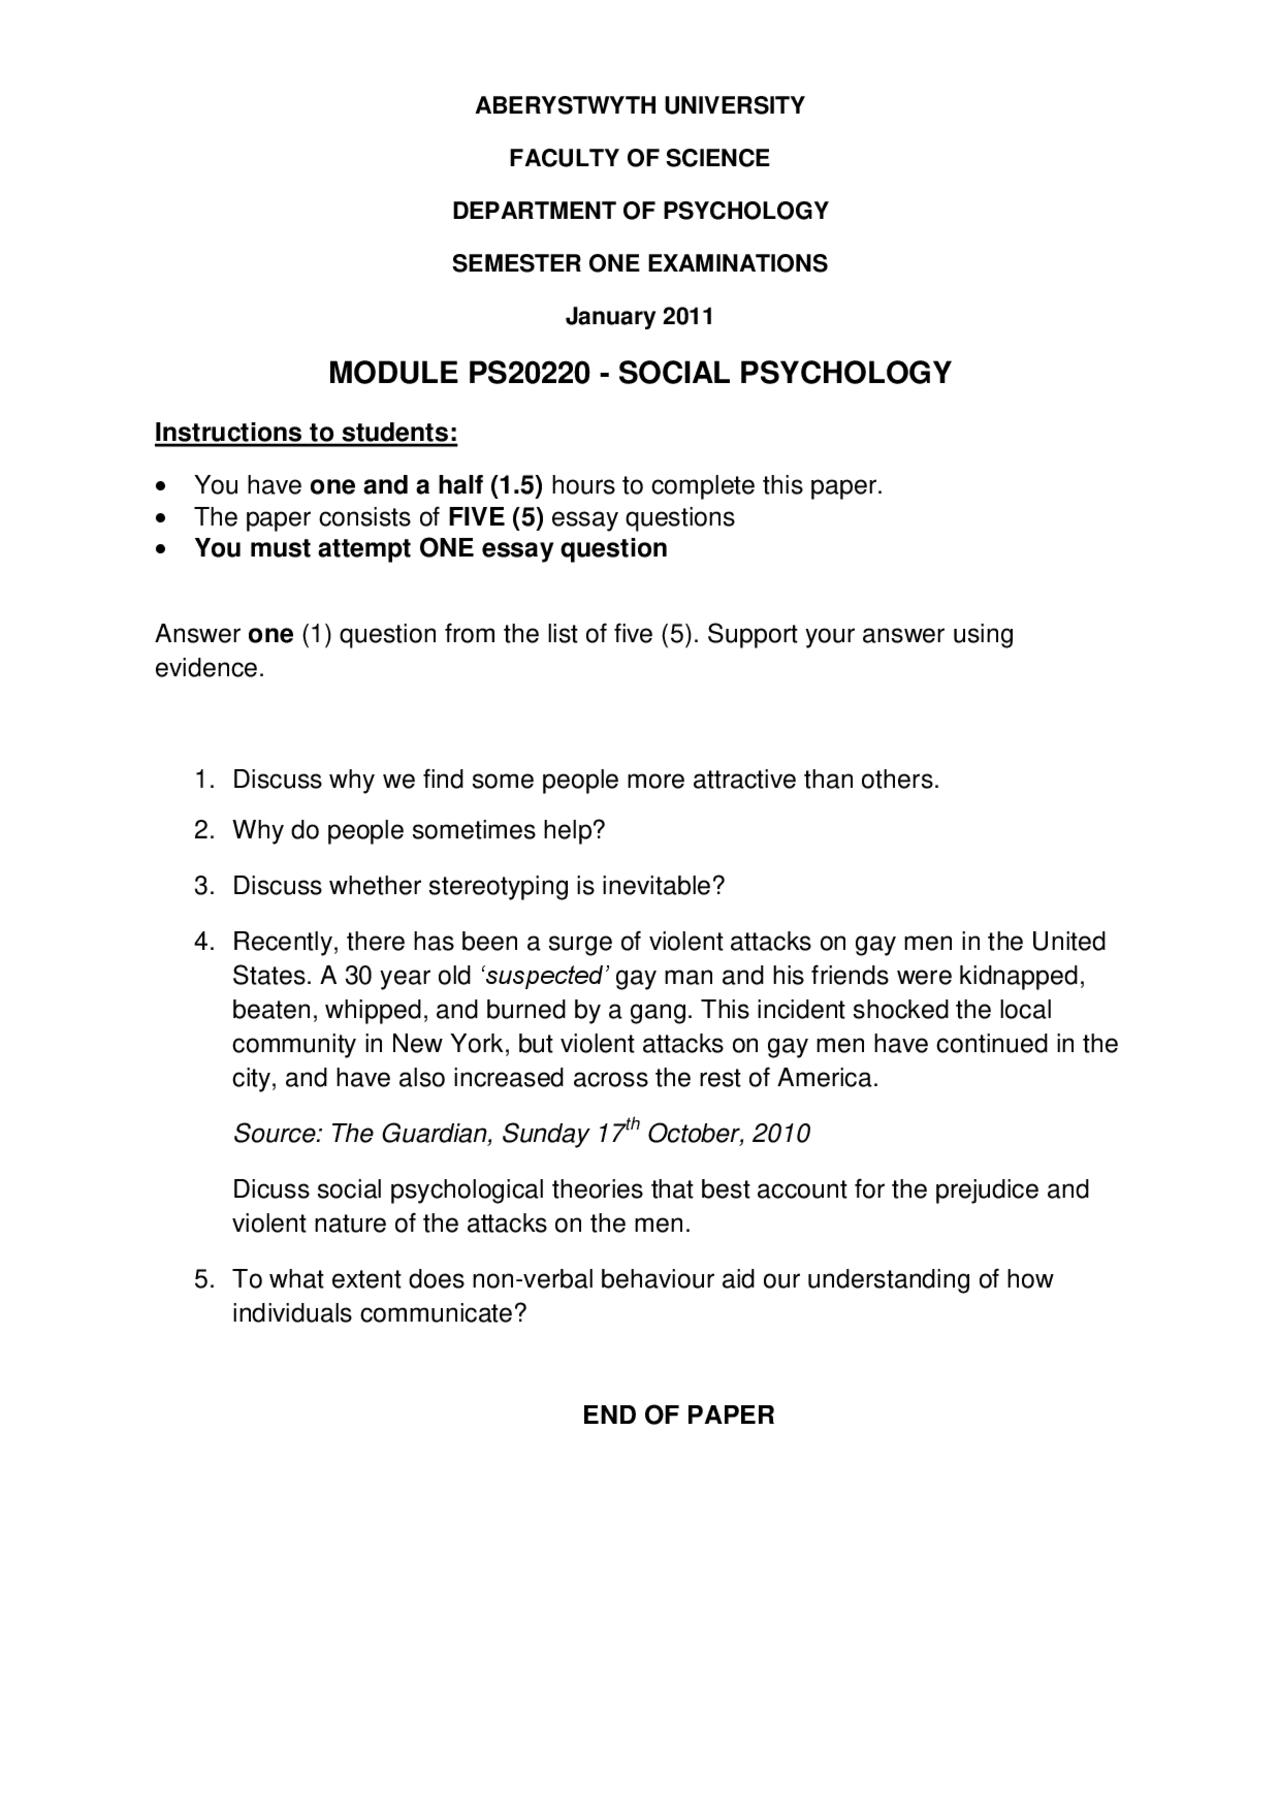 Social psychology essay questions literature review course management system